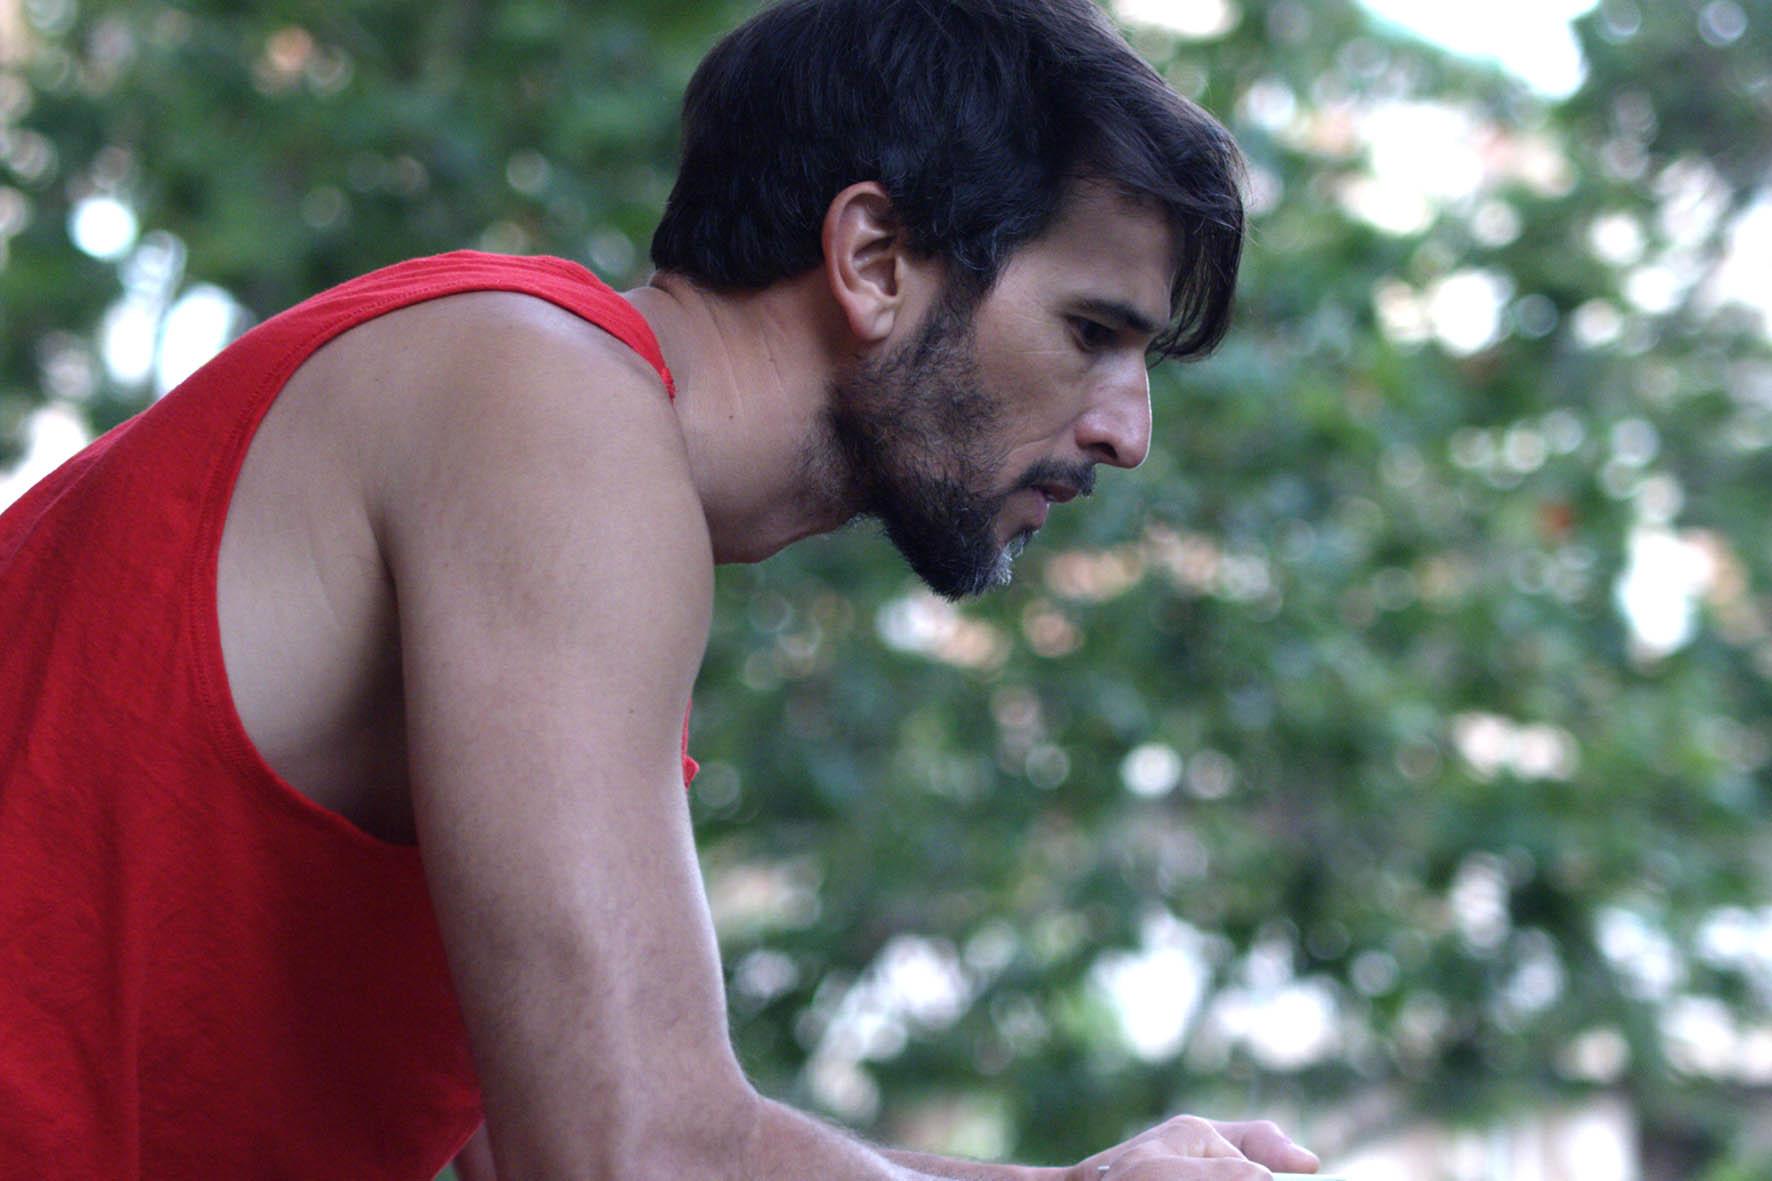 Juan Barberini dans le rôle d'Ocho